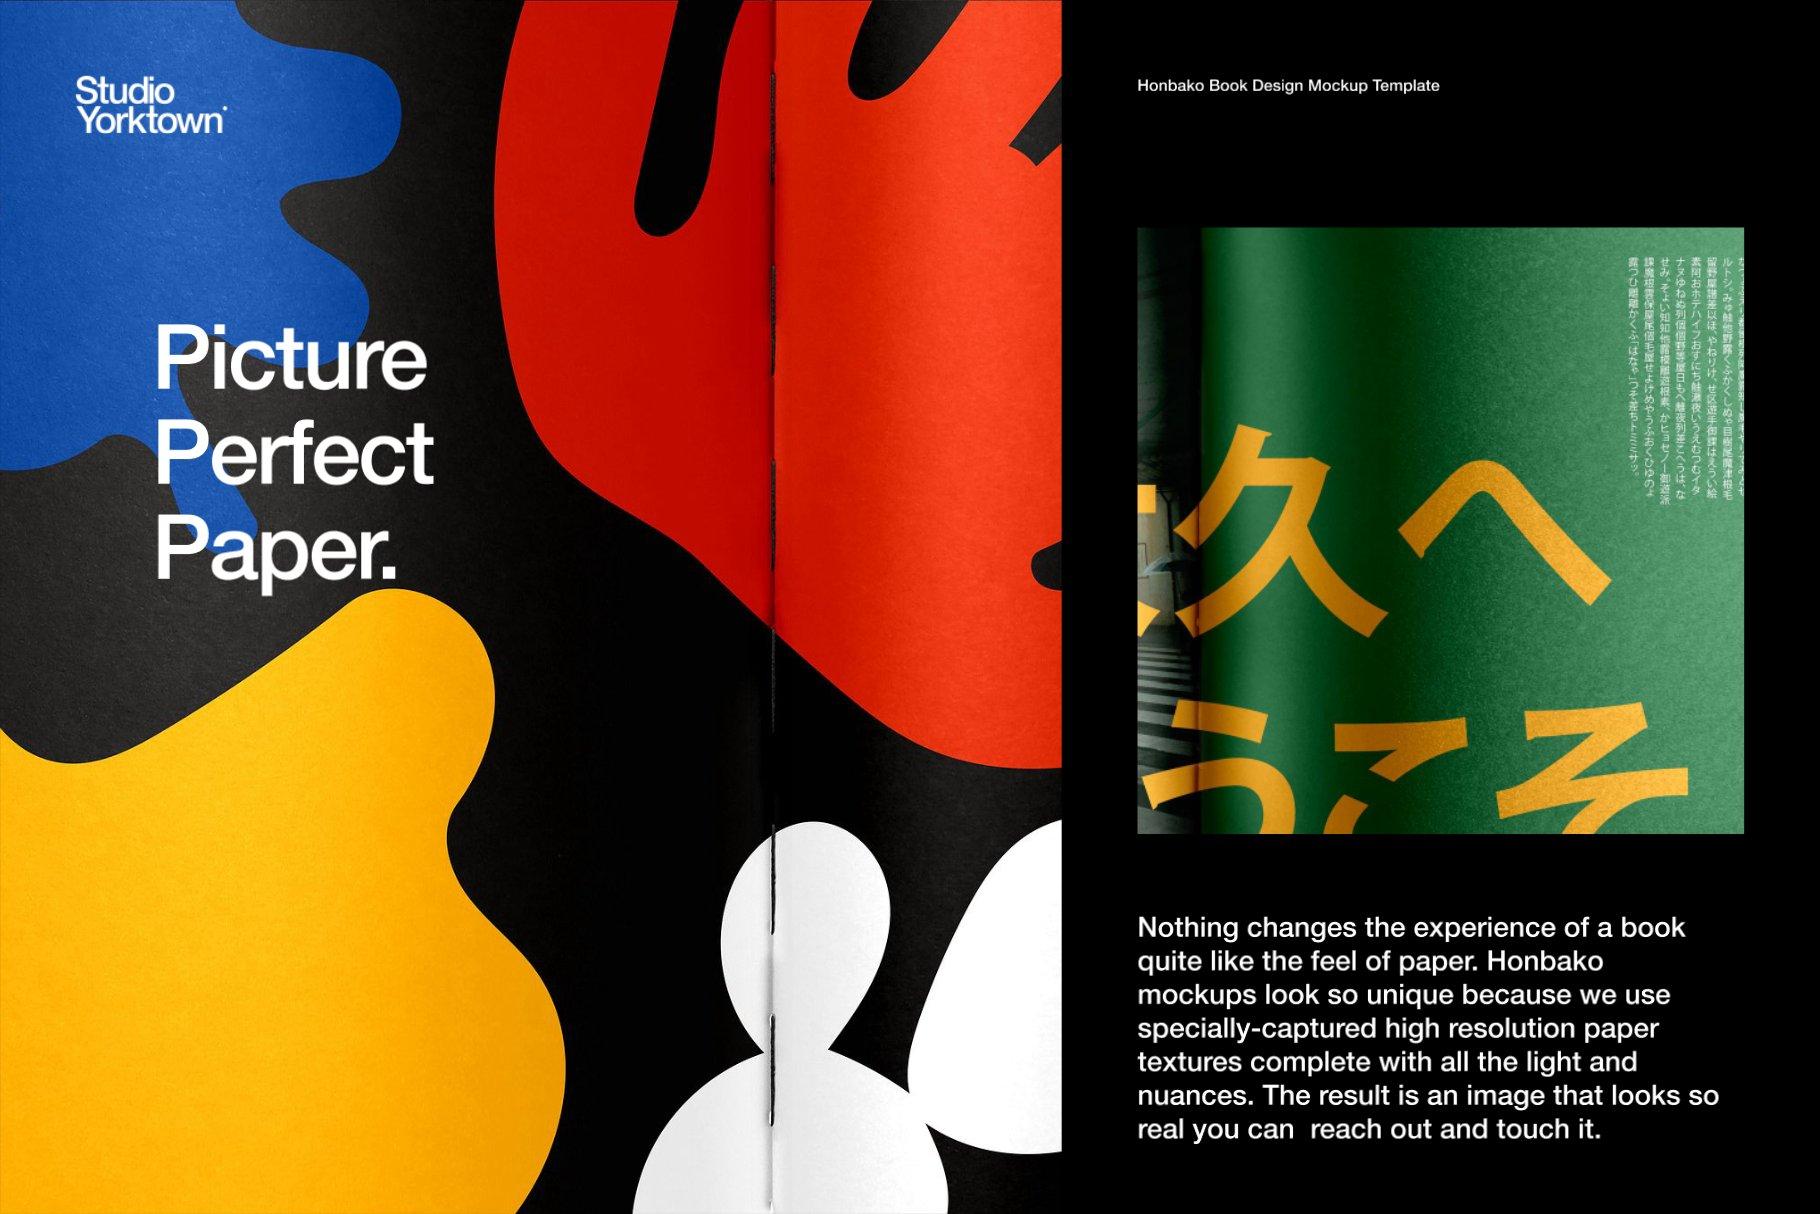 Honbako 逼真全息箔页面卷曲书籍设计PSD样机模板(4329)插图(17)